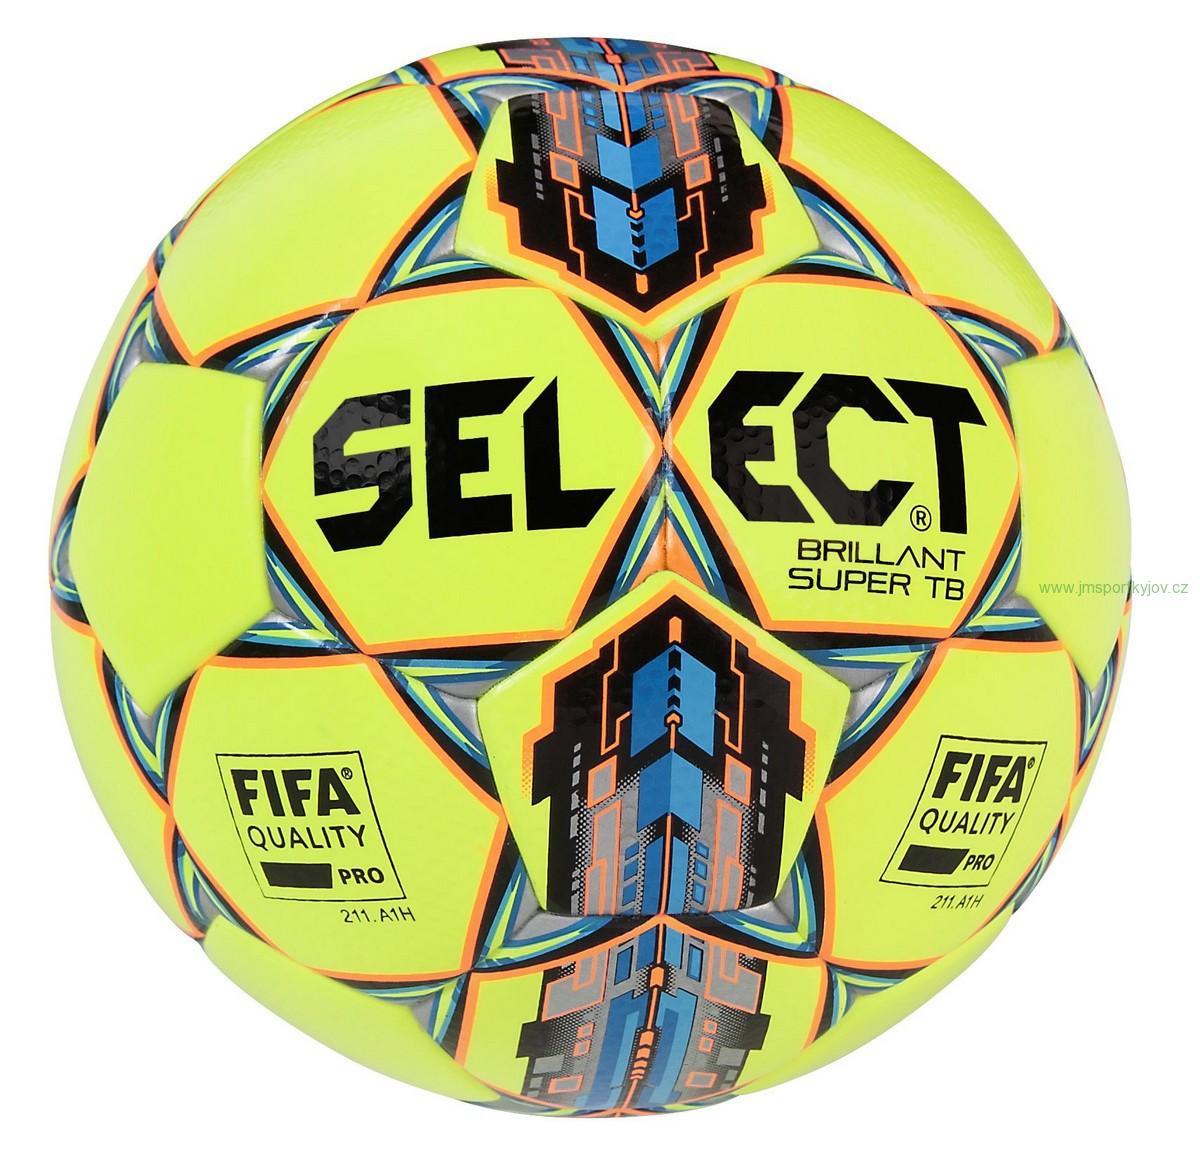 Fotbalový míč Select FB Brillant Super TB (Ž) 766b869c02